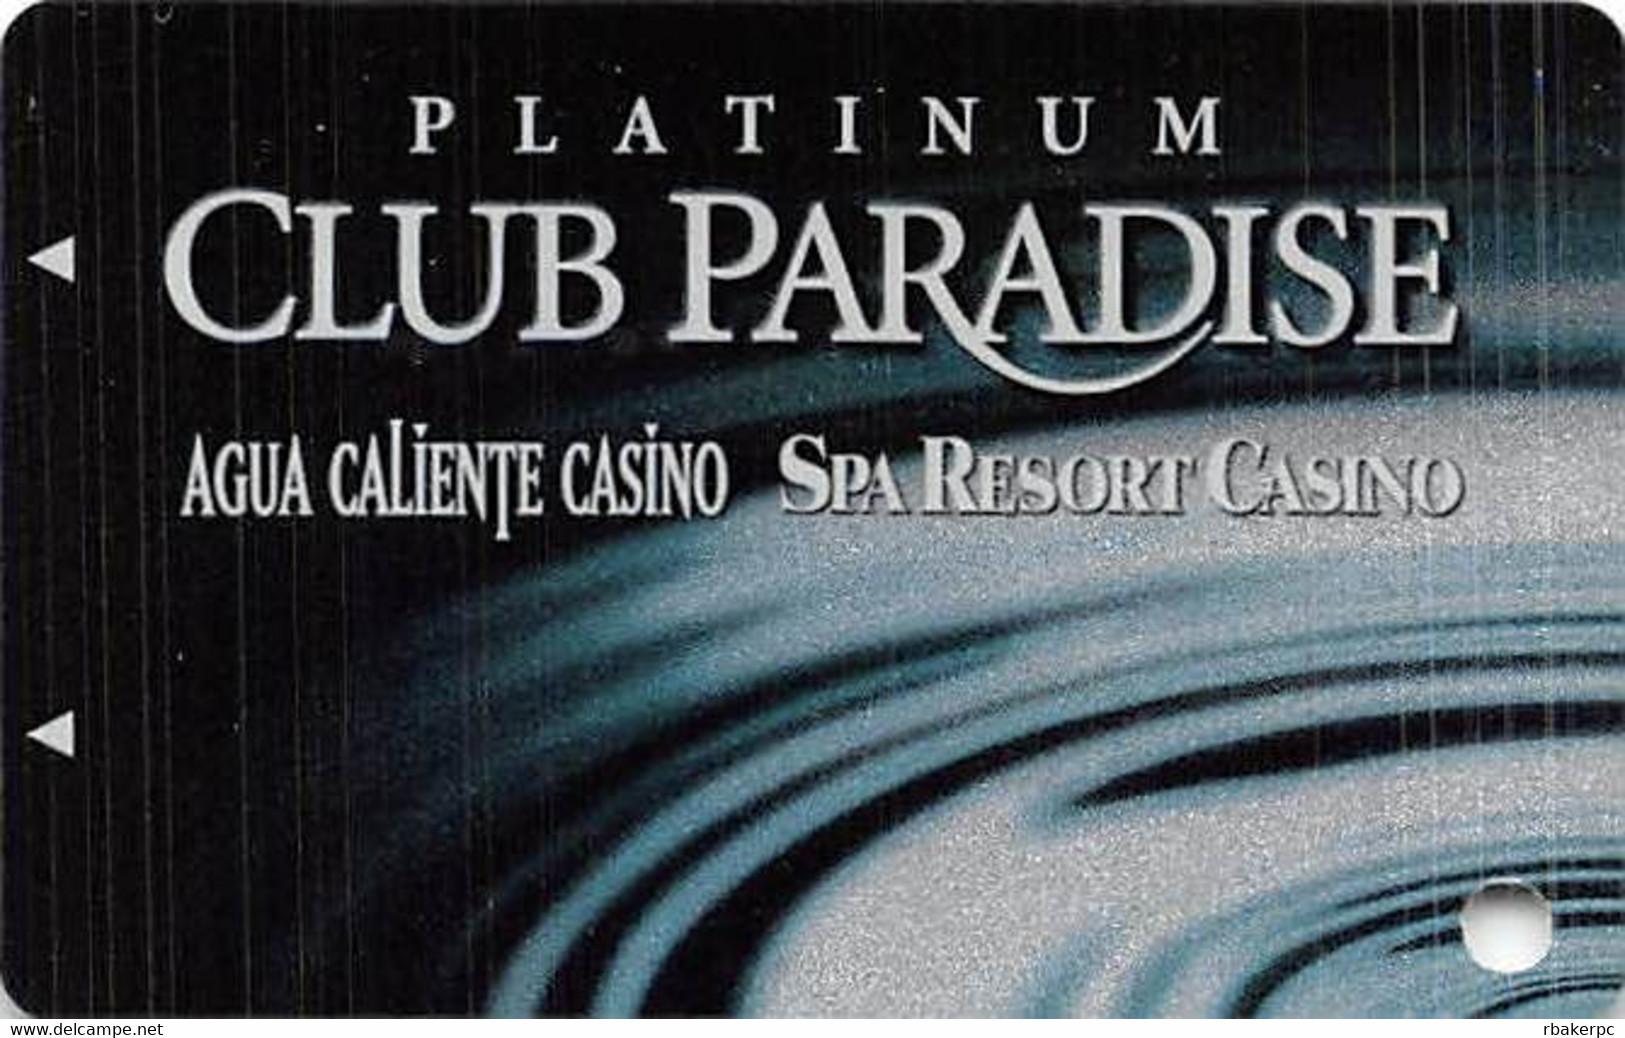 Agua Caliente & Spa Resort Casinos In California, USA - BLANK Slot Card - Casino Cards